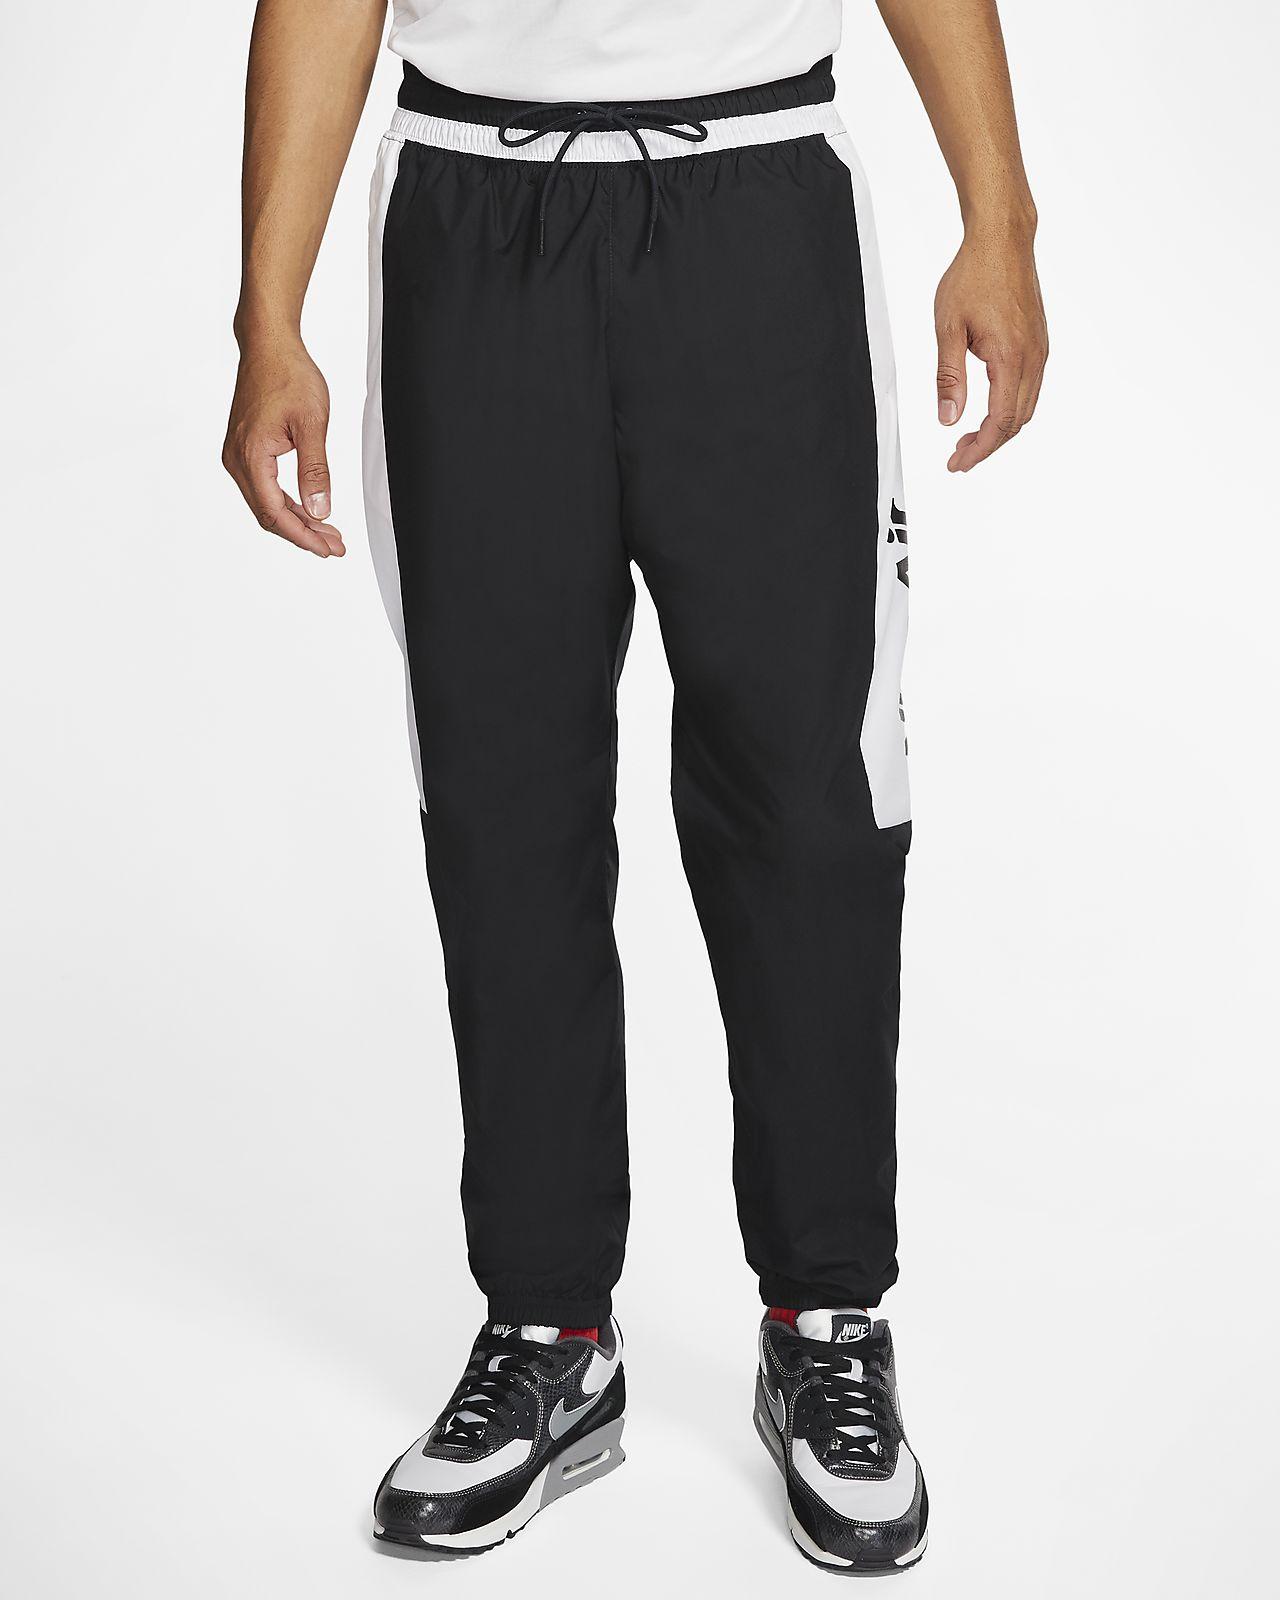 pantalon homme sportwear air nike